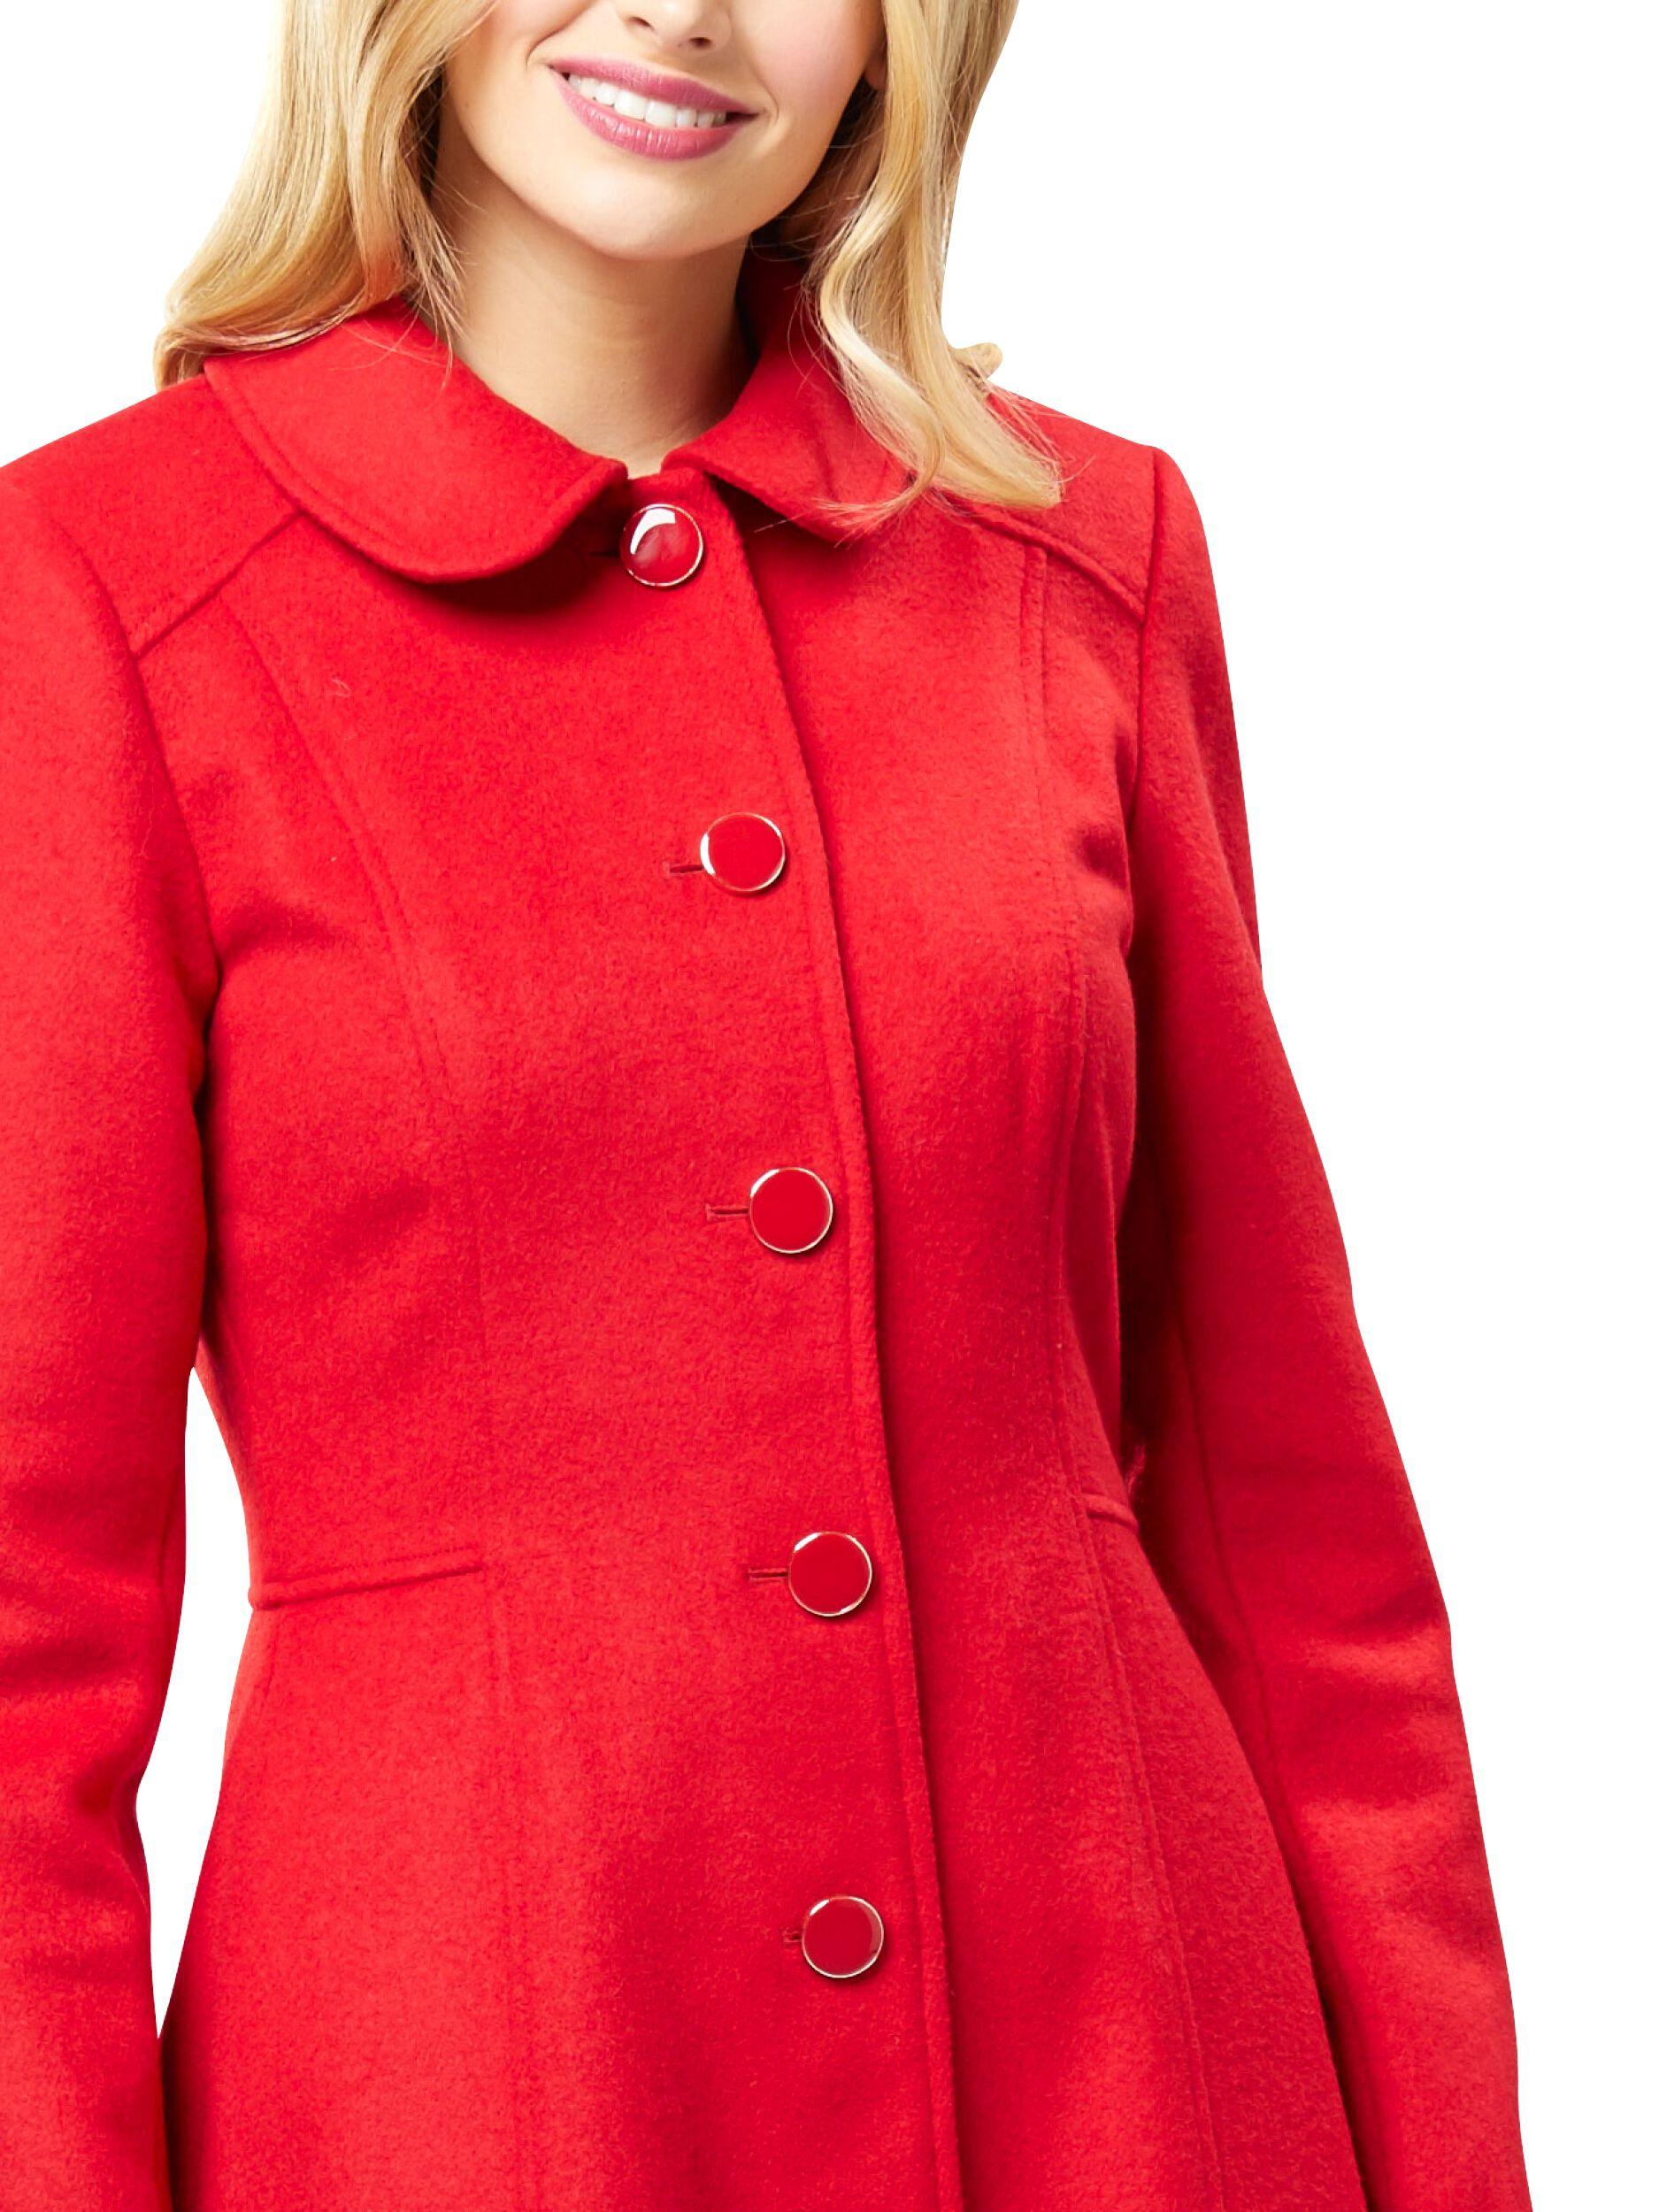 Lady Belle Coat